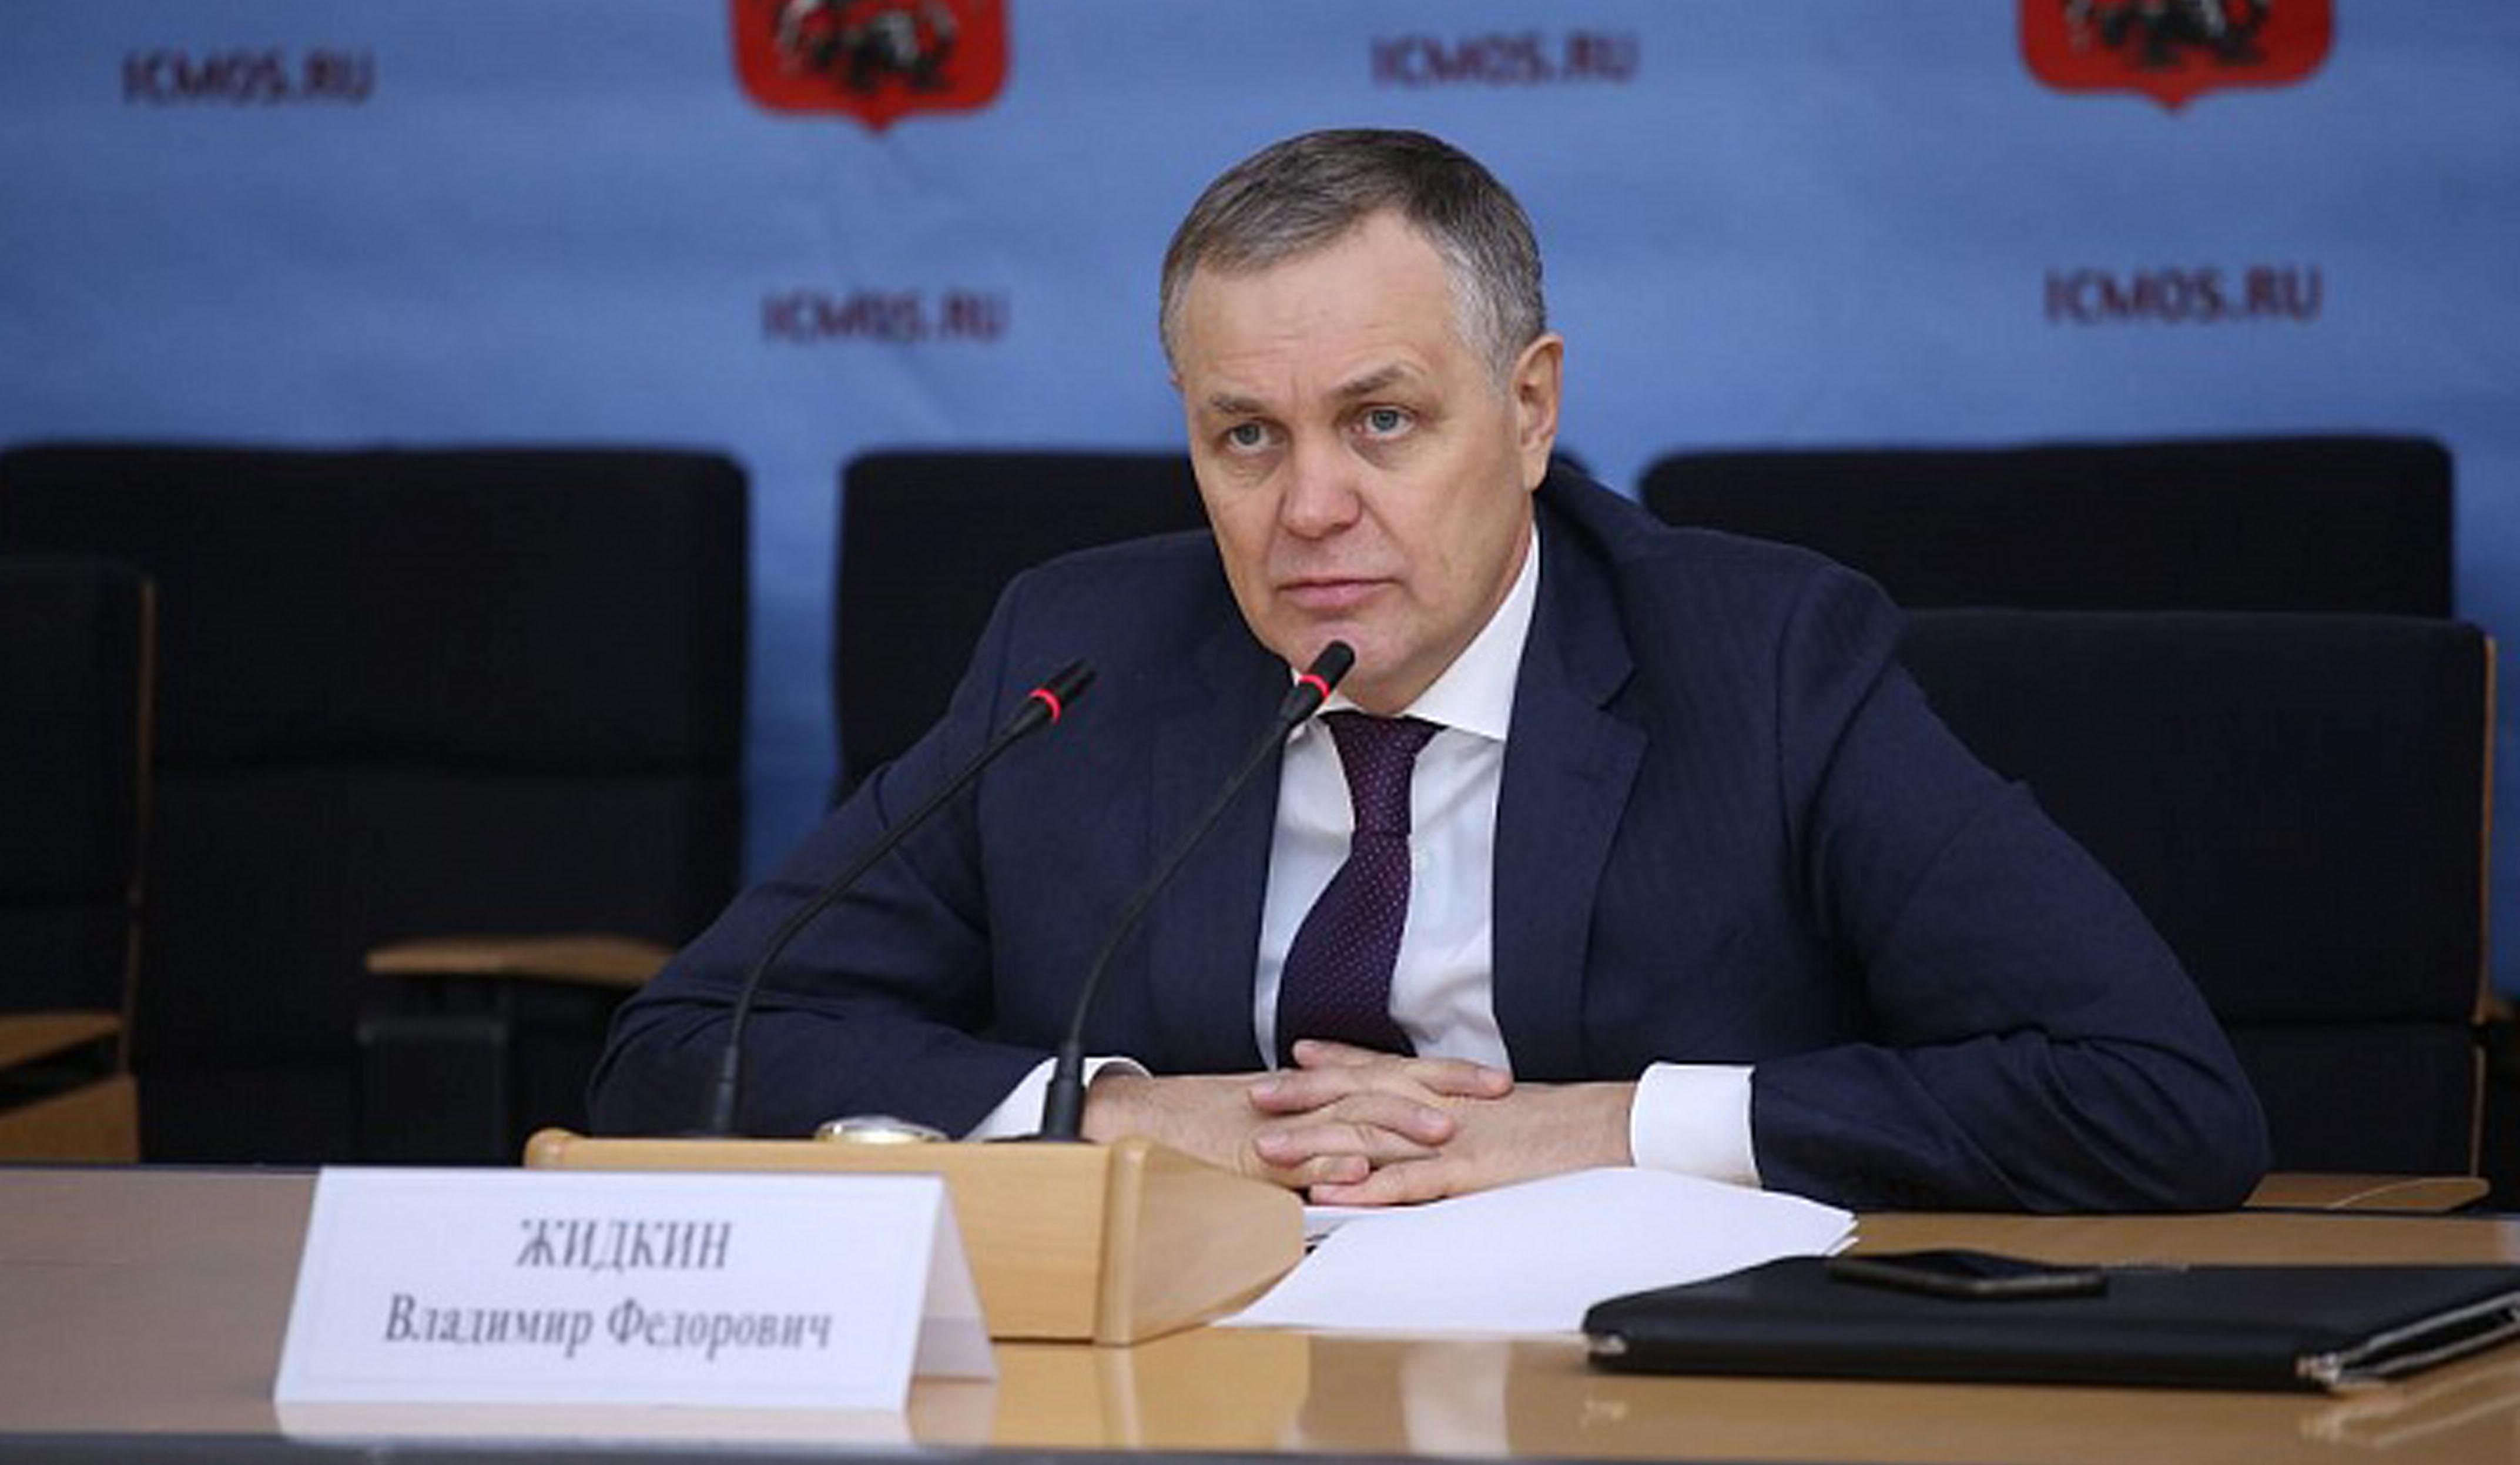 Жидкин Владимир Федорович